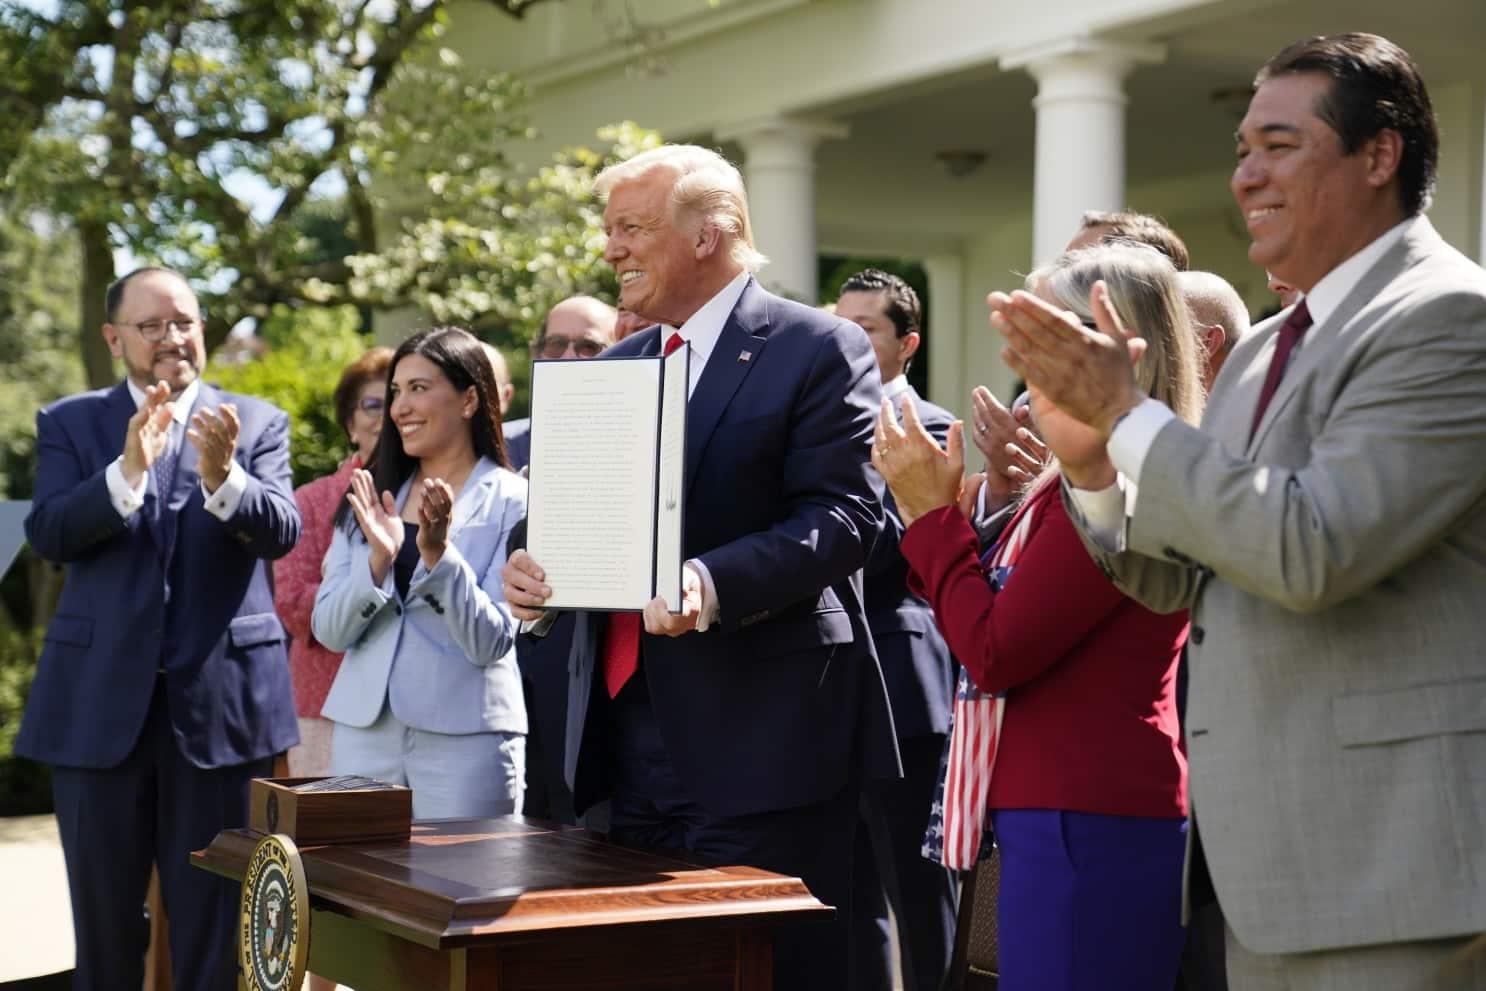 Hispanic Leader Says Half Of Trump's Advisory Board Is 'Ready To Resign Today'